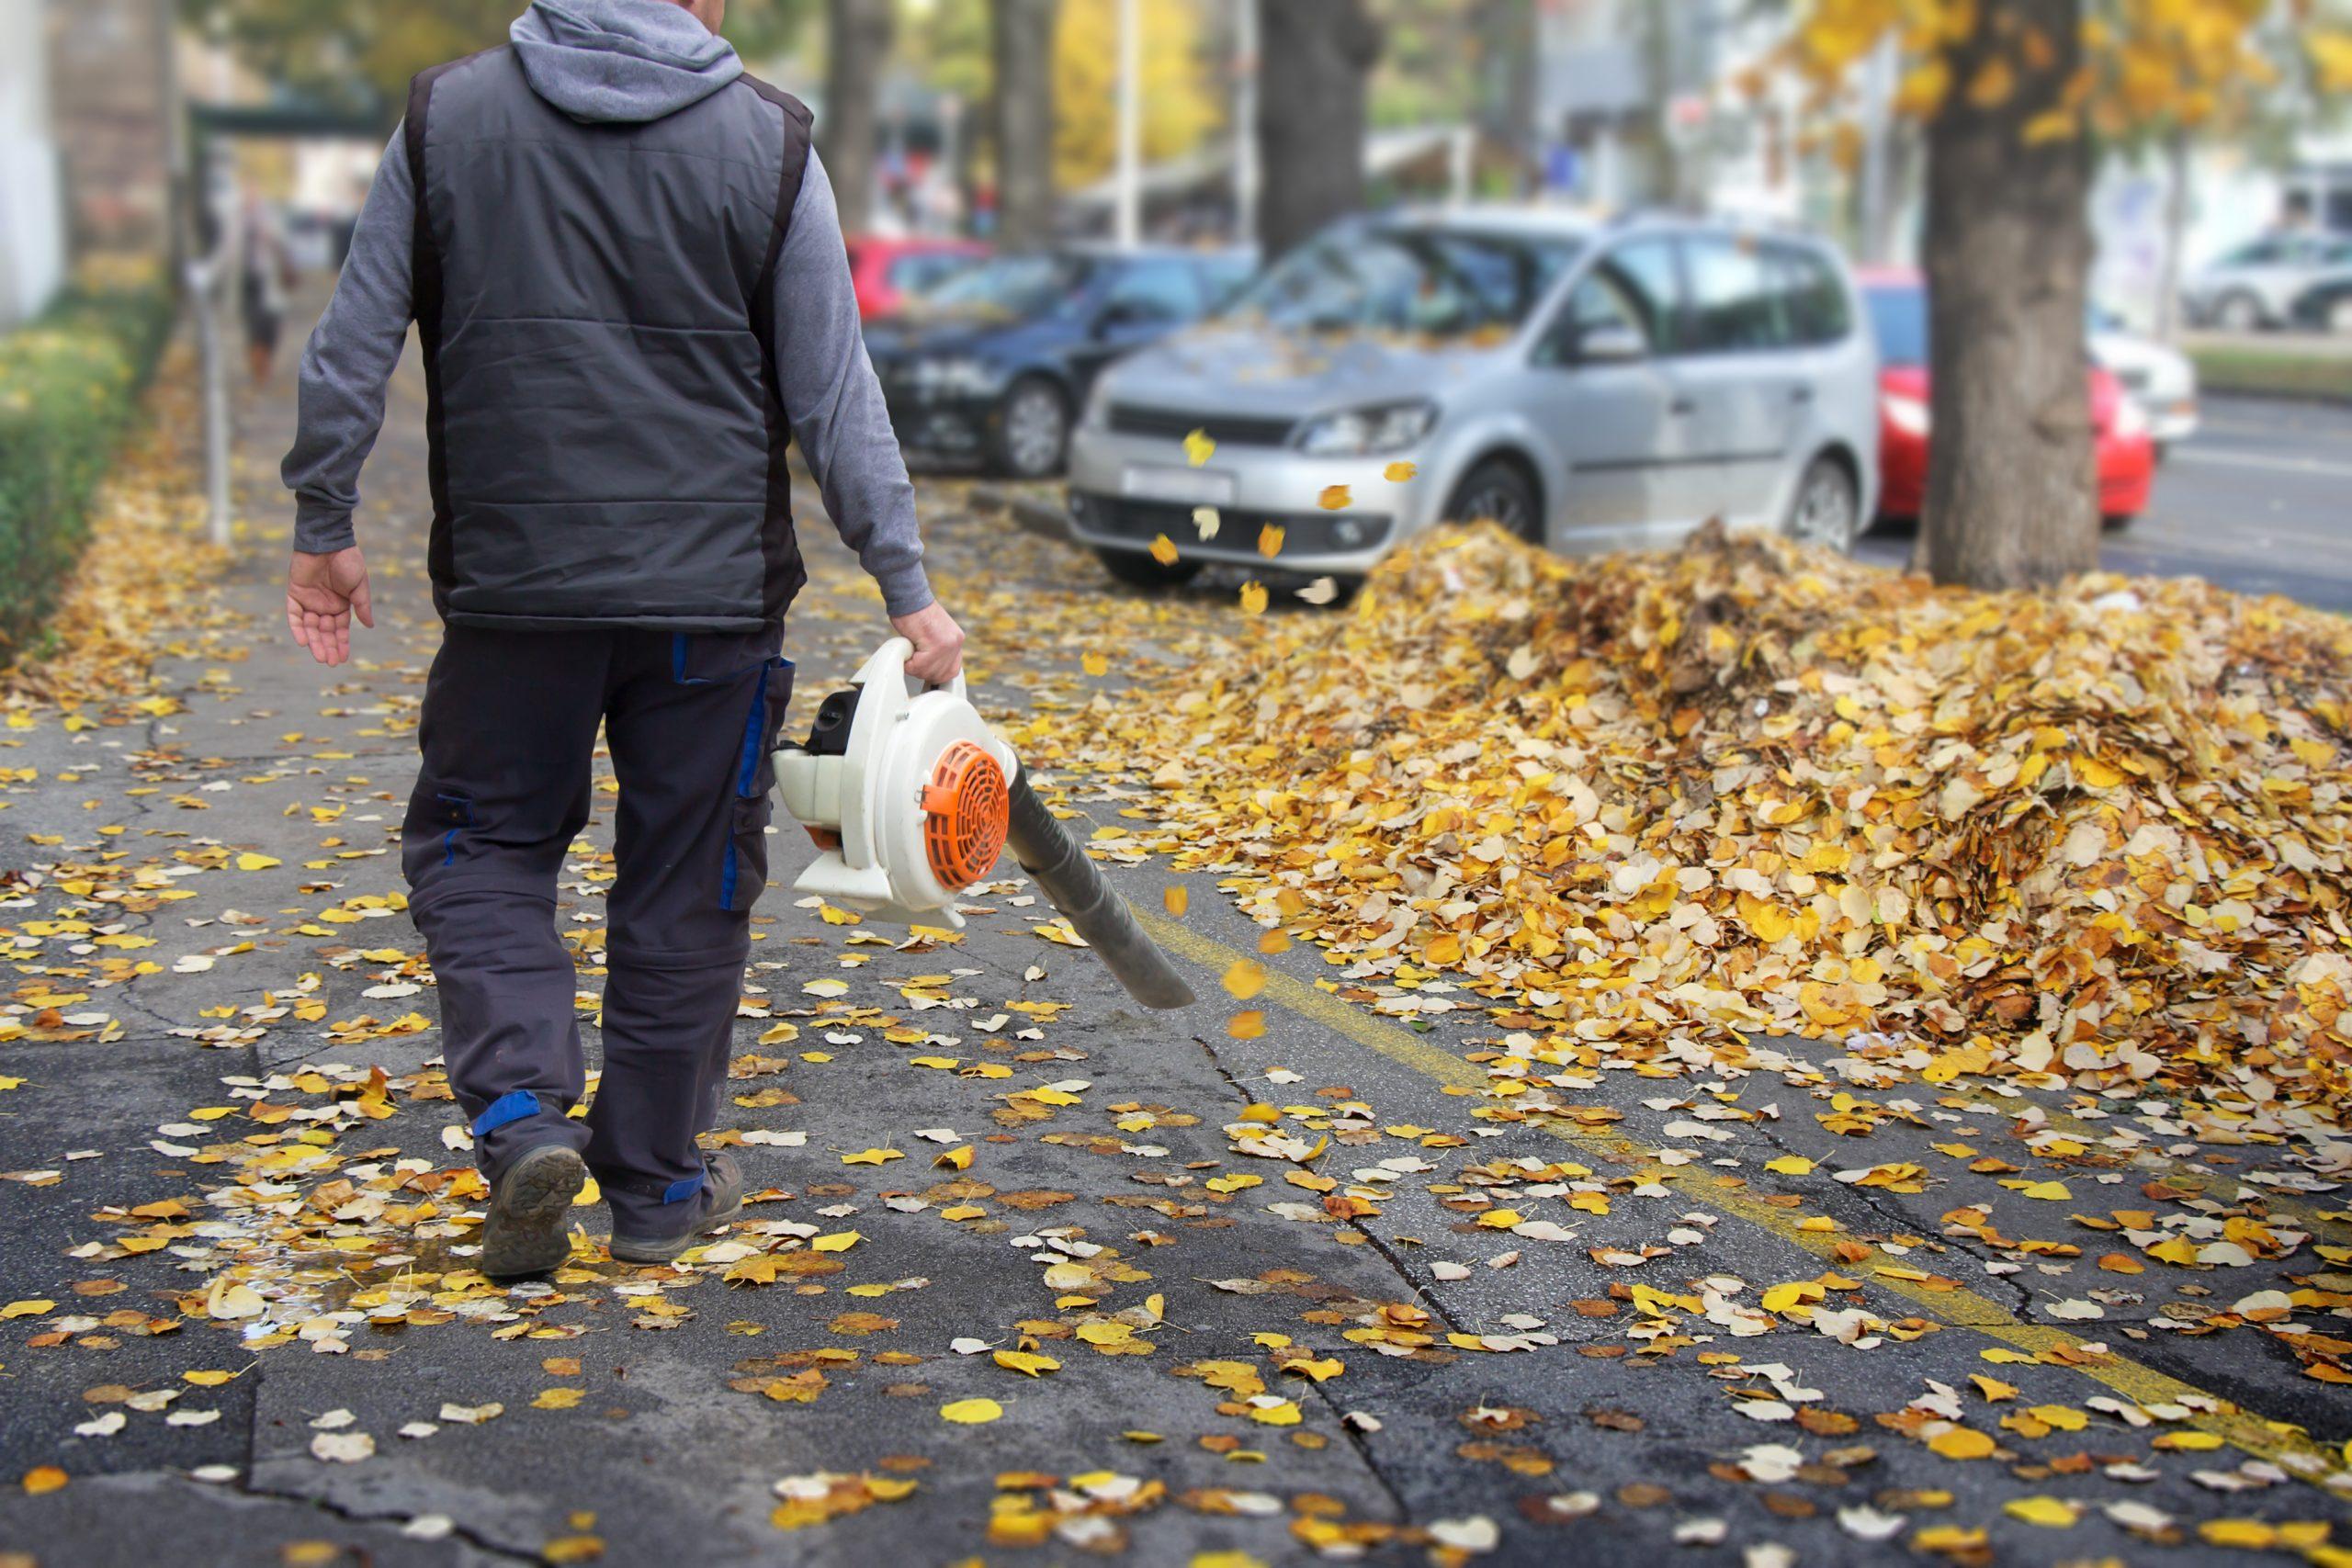 Leaf Cleanup - Curbside Leaves Pick Up